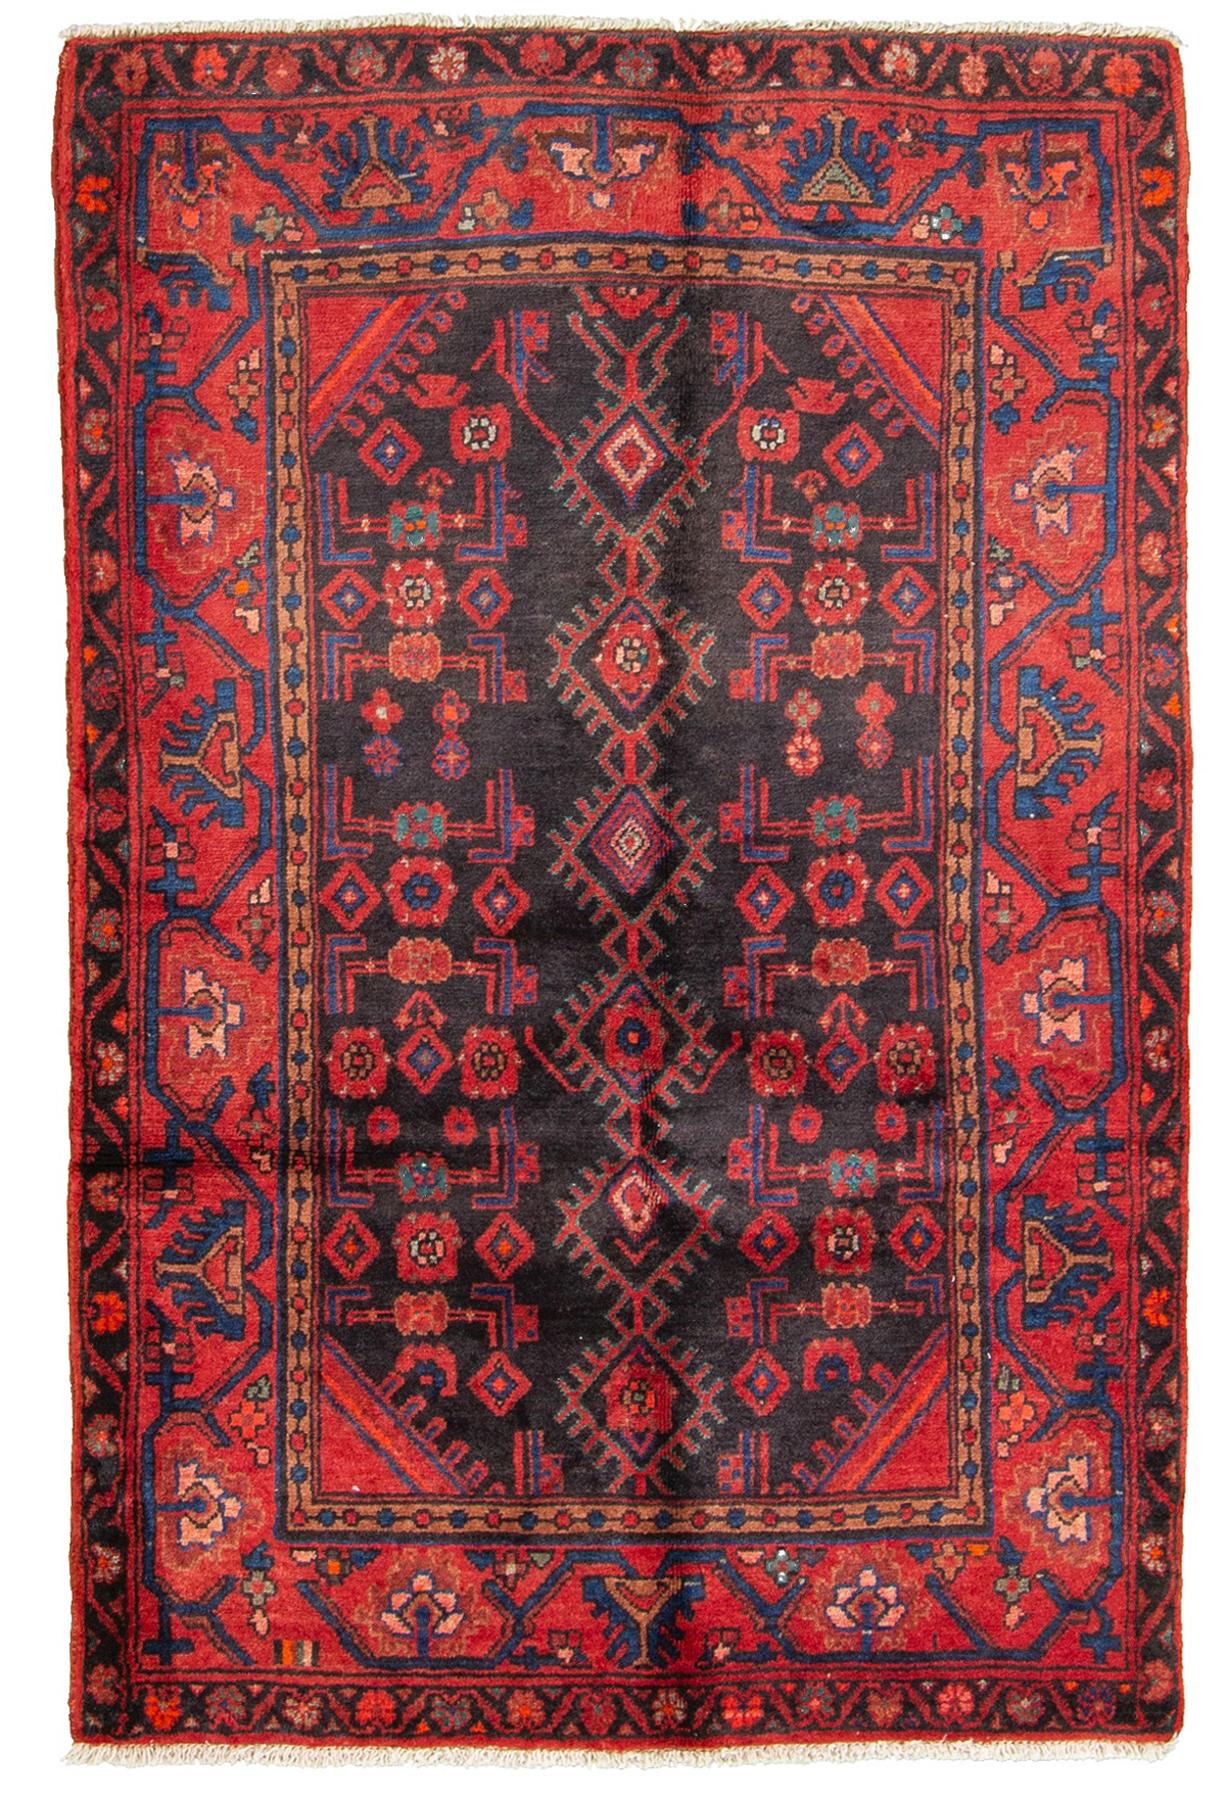 "Hand-knotted Hamadan  Wool Rug 3'6"" x 5'3""  Size: 3'6"" x 5'3"""